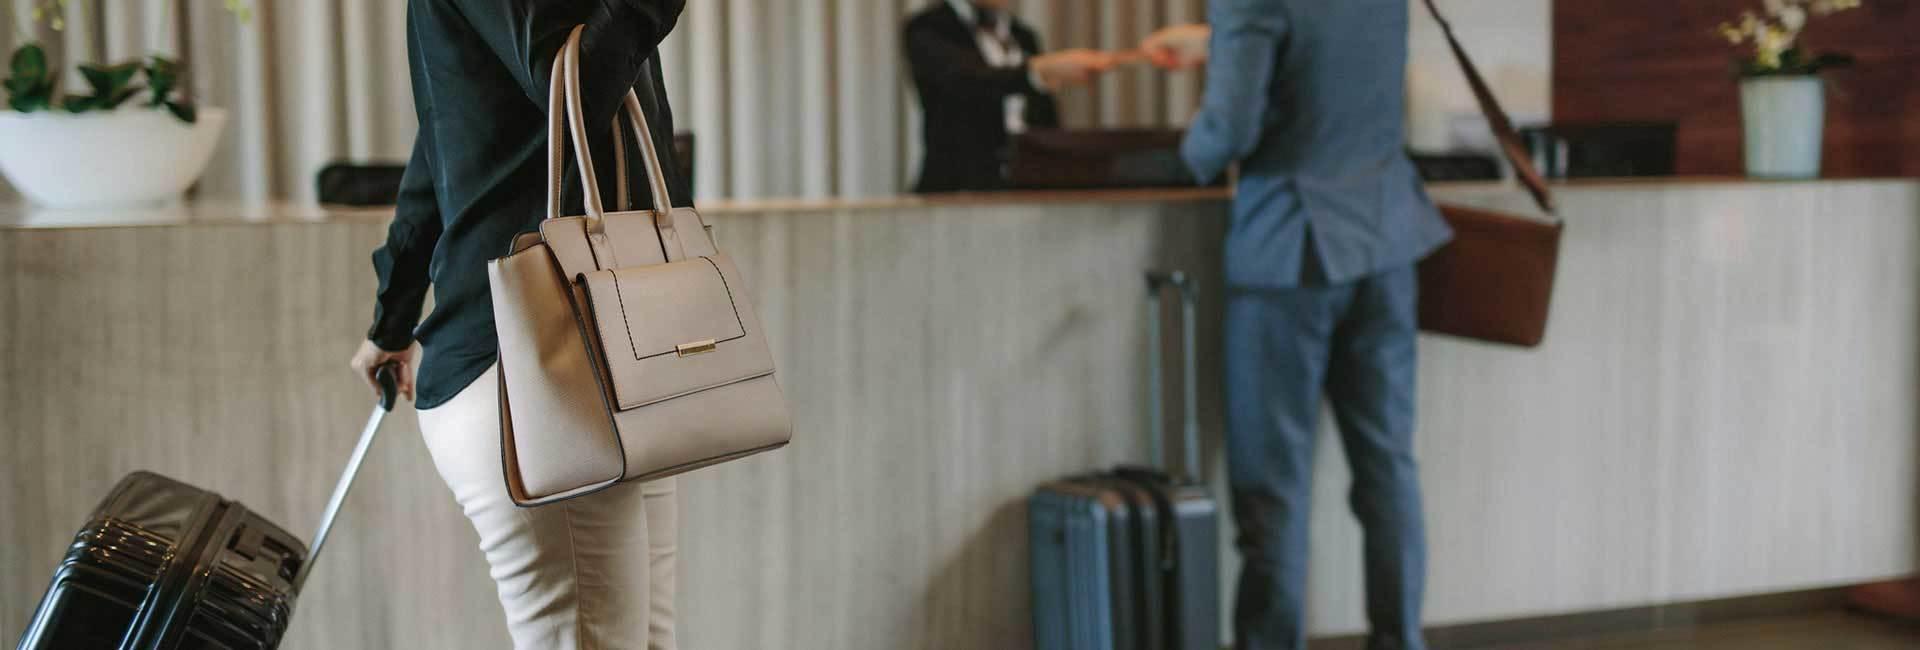 Flight Booking Samsky Travel, Holiday Booking Samsky Travel, Samsky Travel Agent London